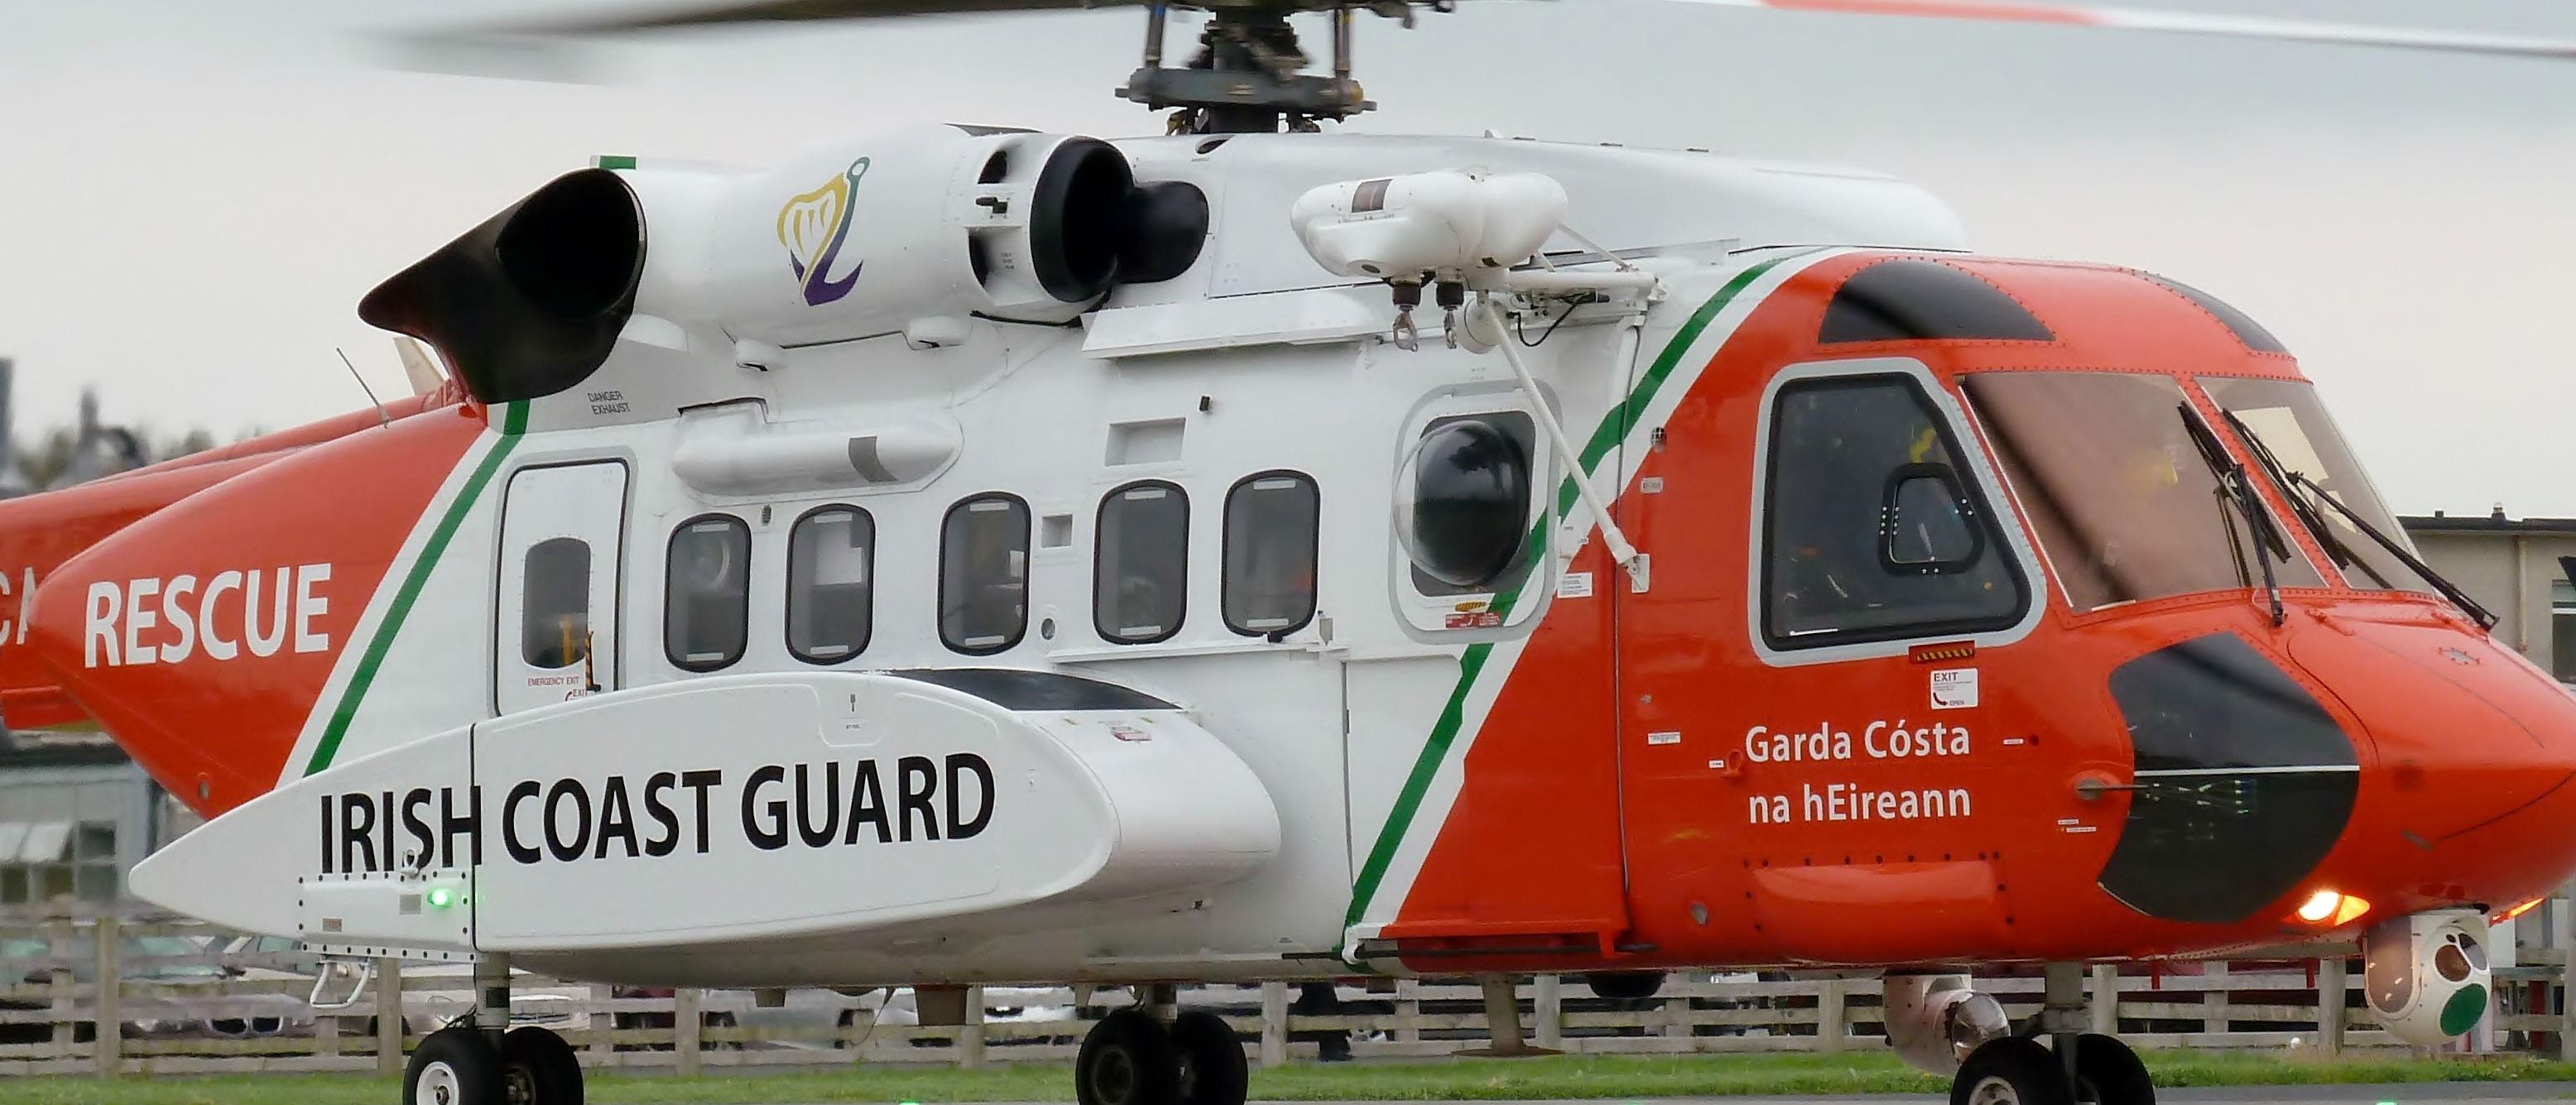 Body Found At Rescue 116 Crash Site